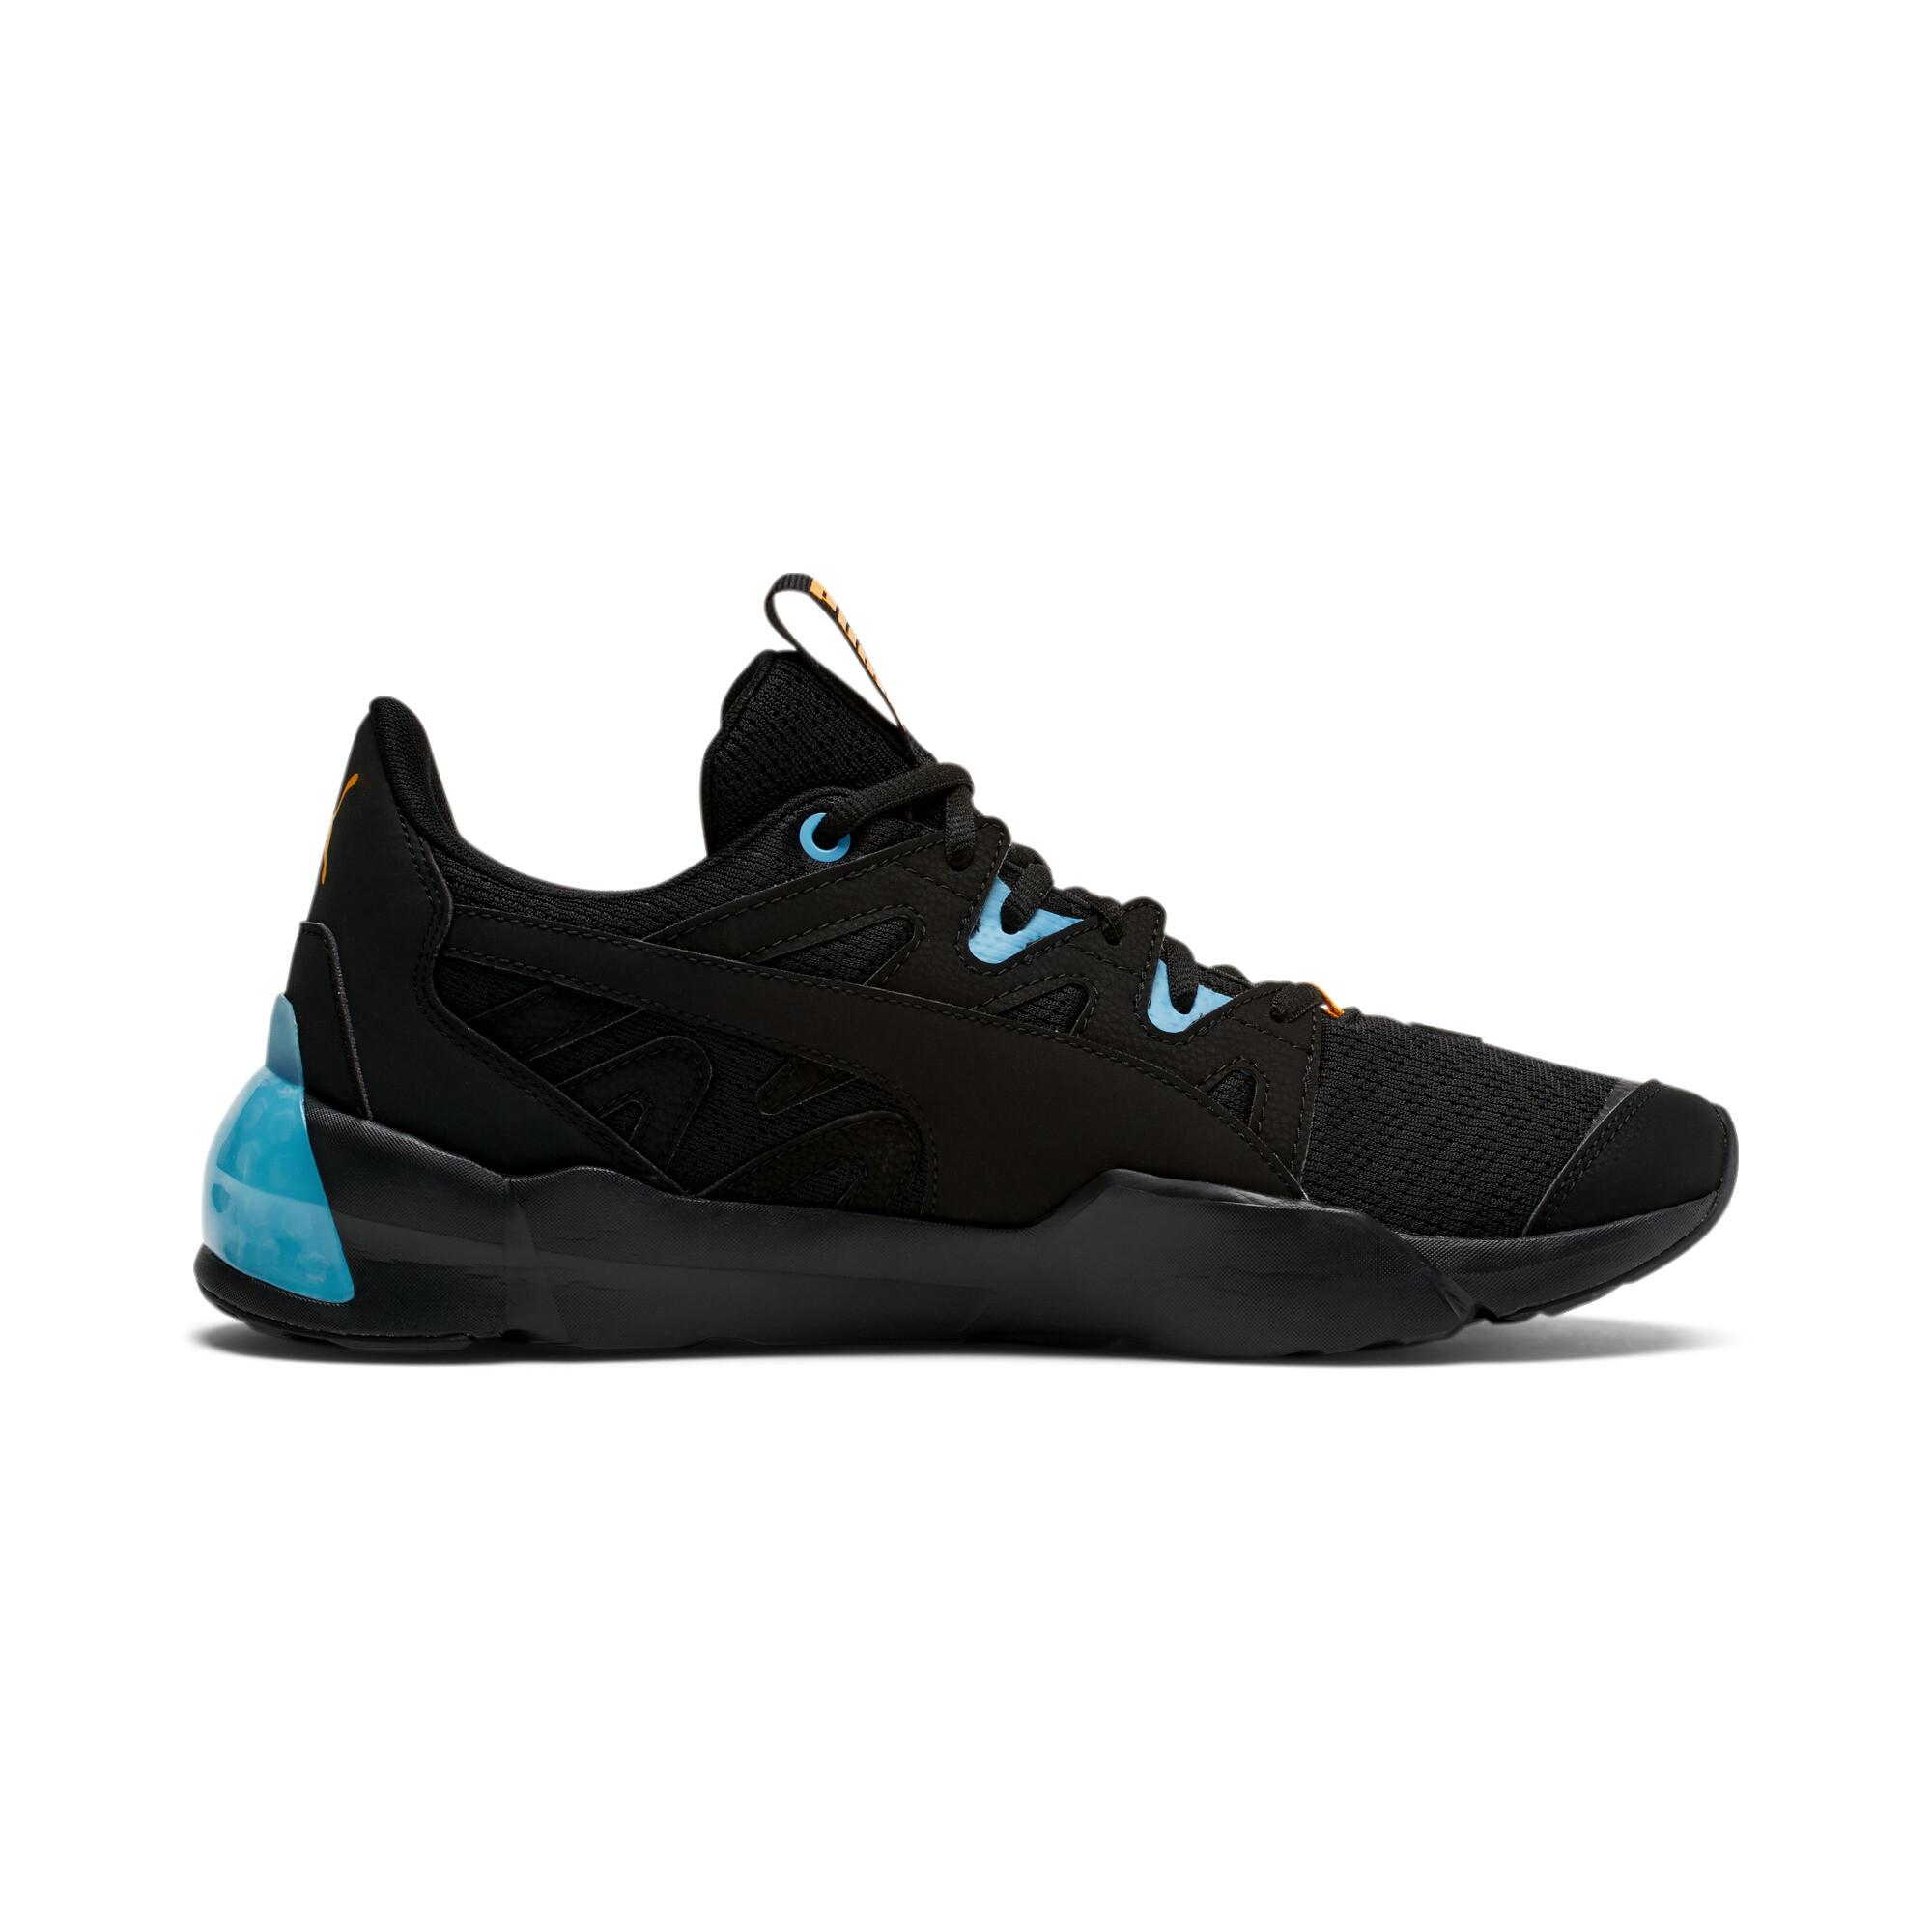 PUMA-Men-039-s-CELL-Pharos-Training-Shoes thumbnail 24